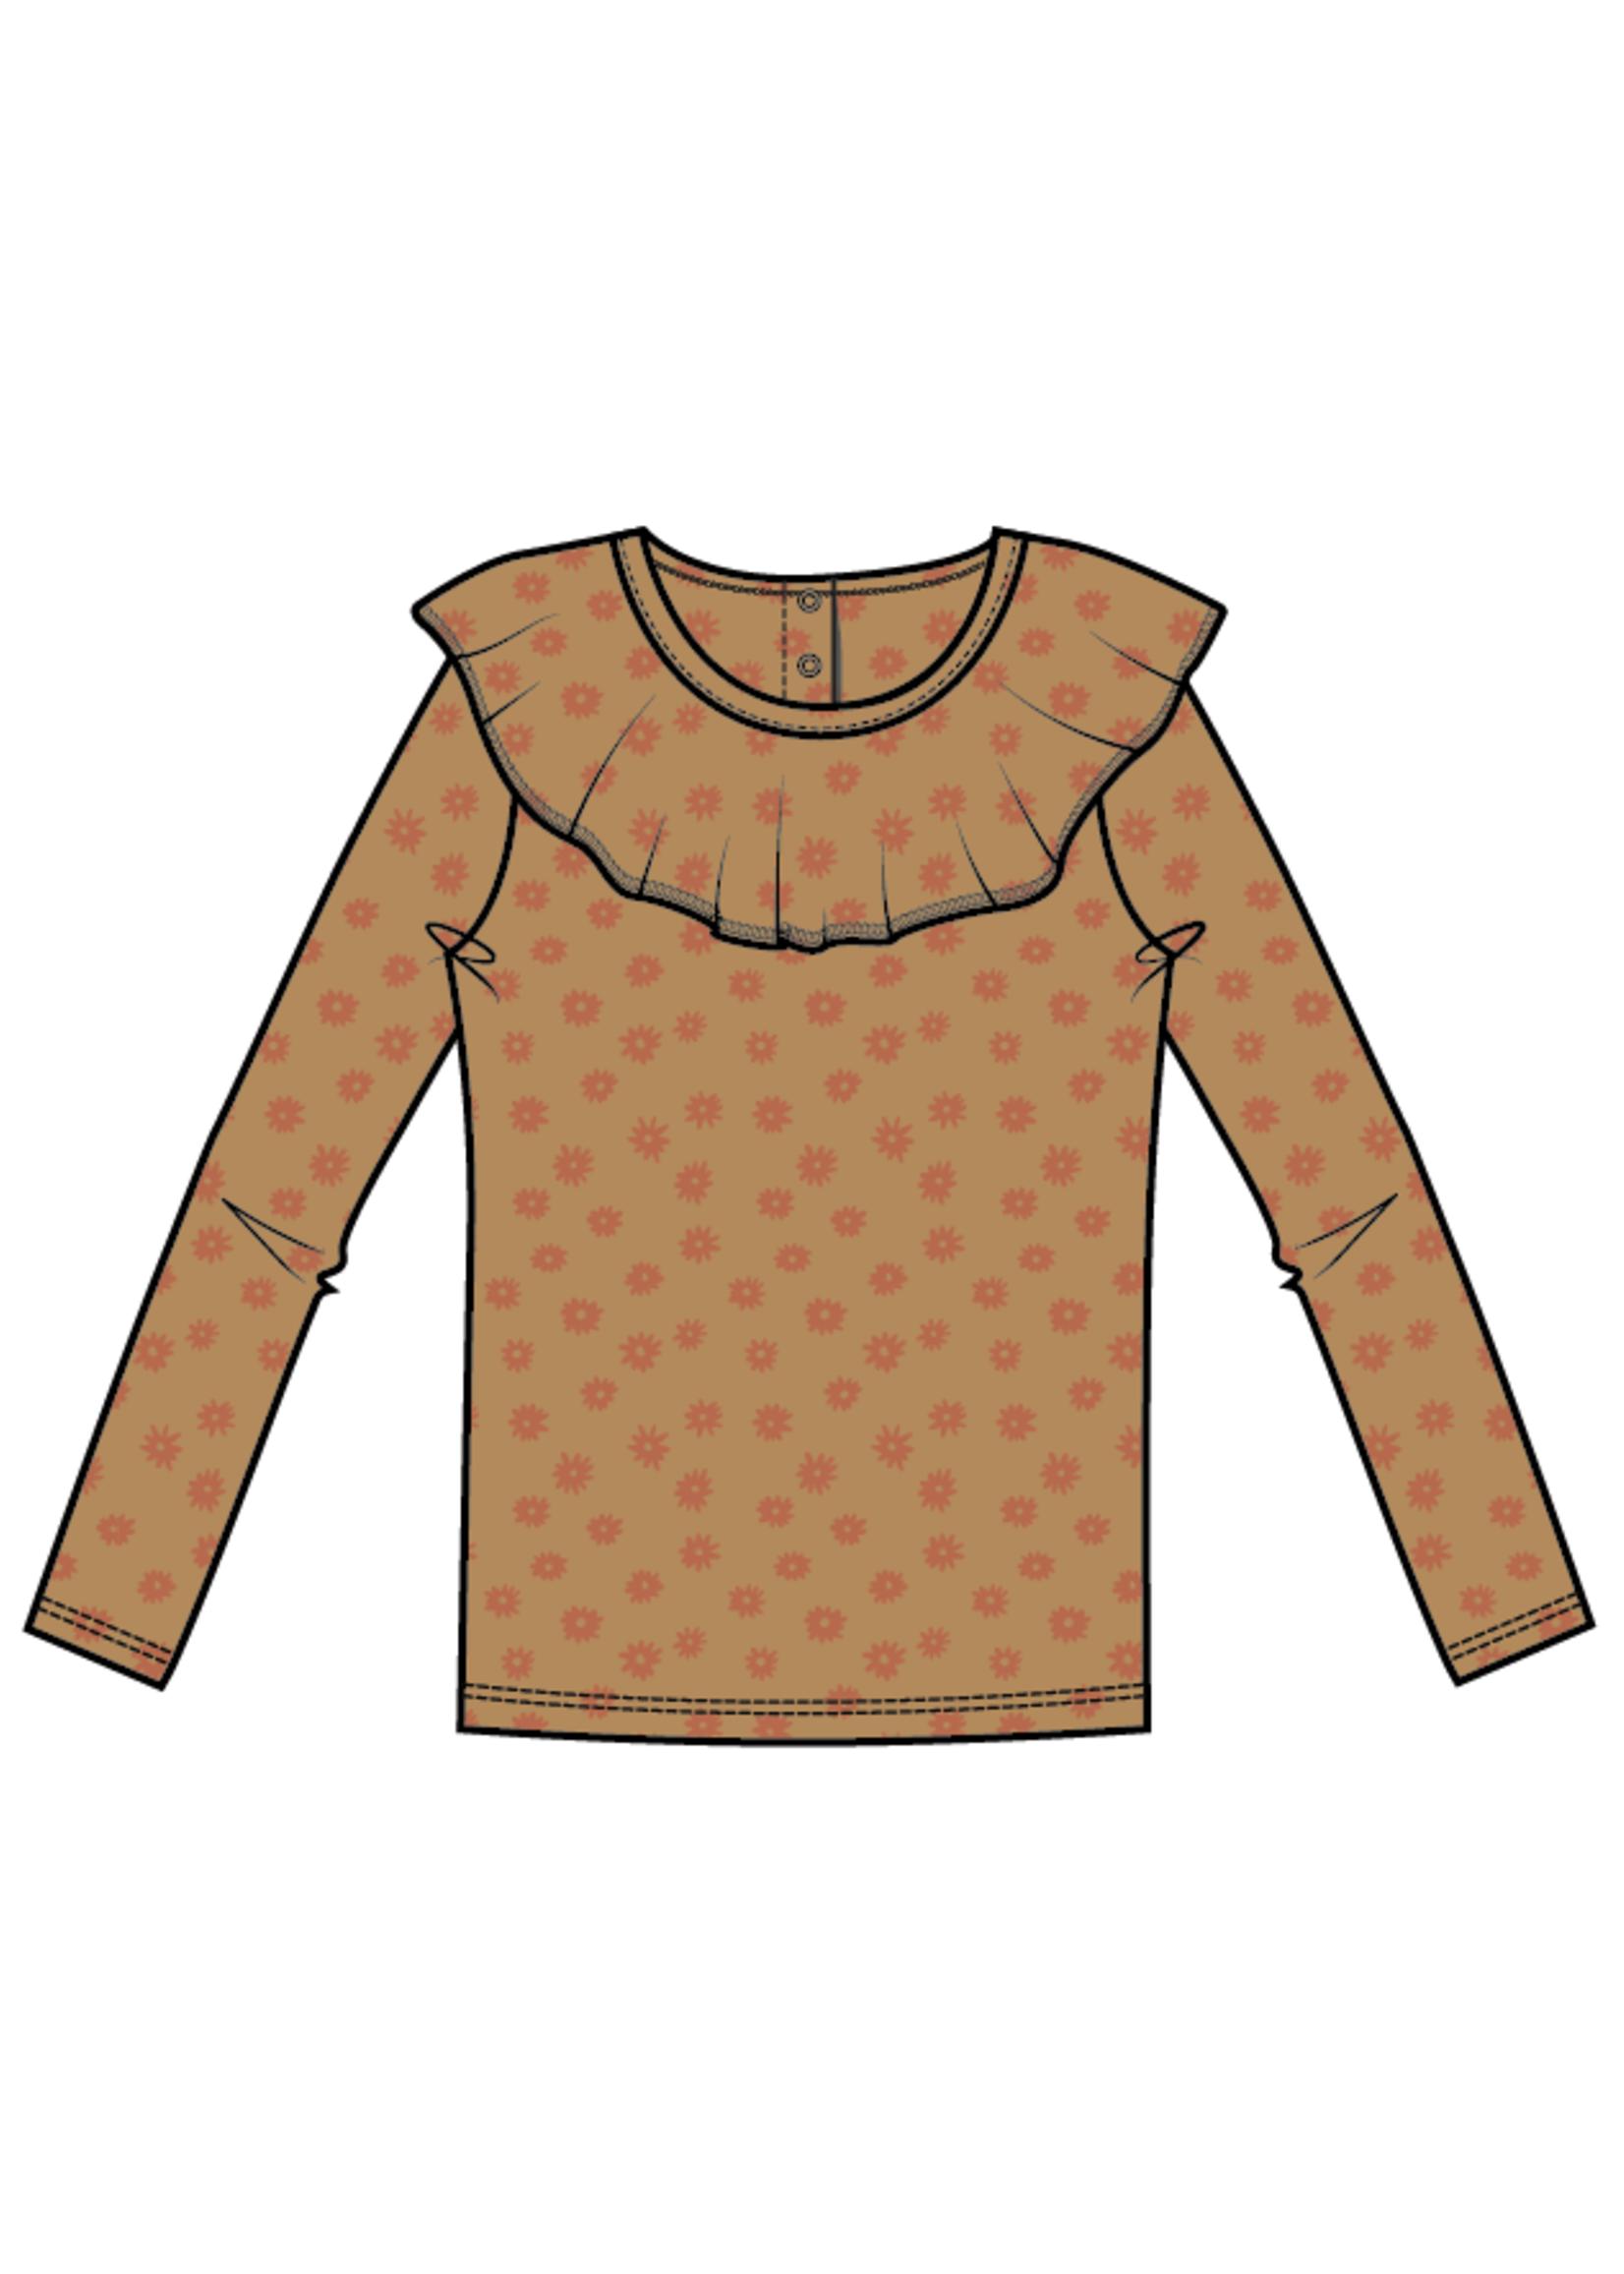 Blossom Kids Long sleeve shirt with volan collar - Winter Flower